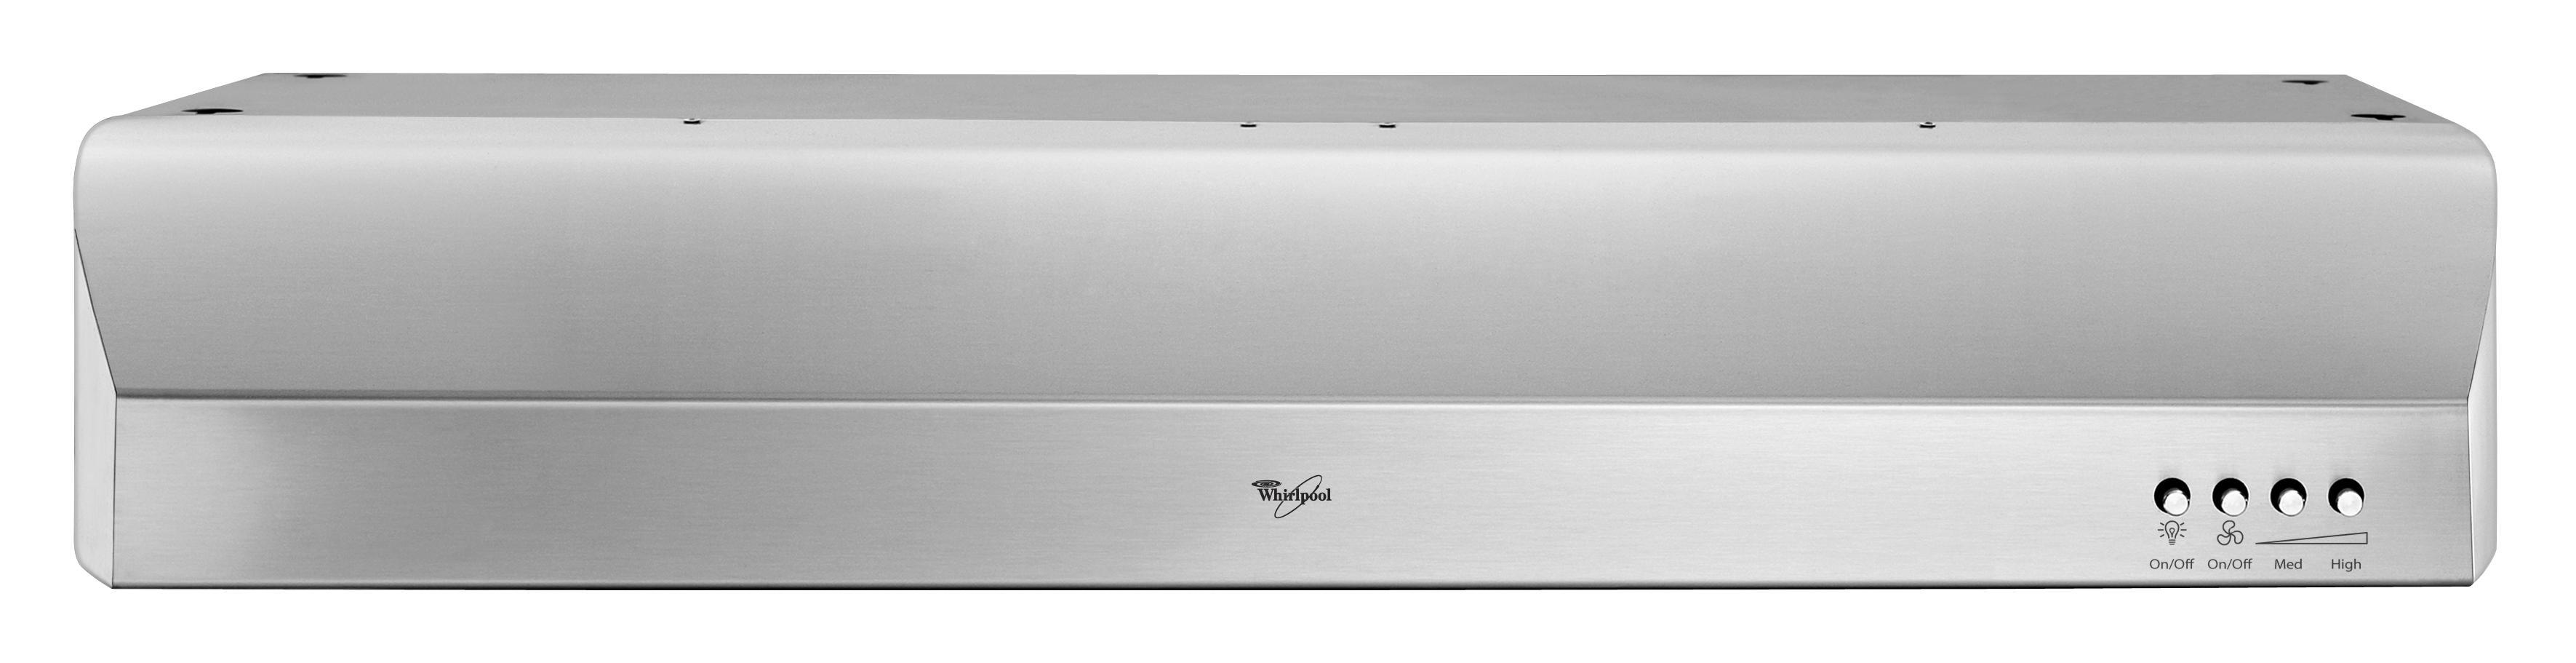 "Whirlpool Ventilation 30"" Under-the-Cabinet Range Hood - Item Number: GXU7130DXS"